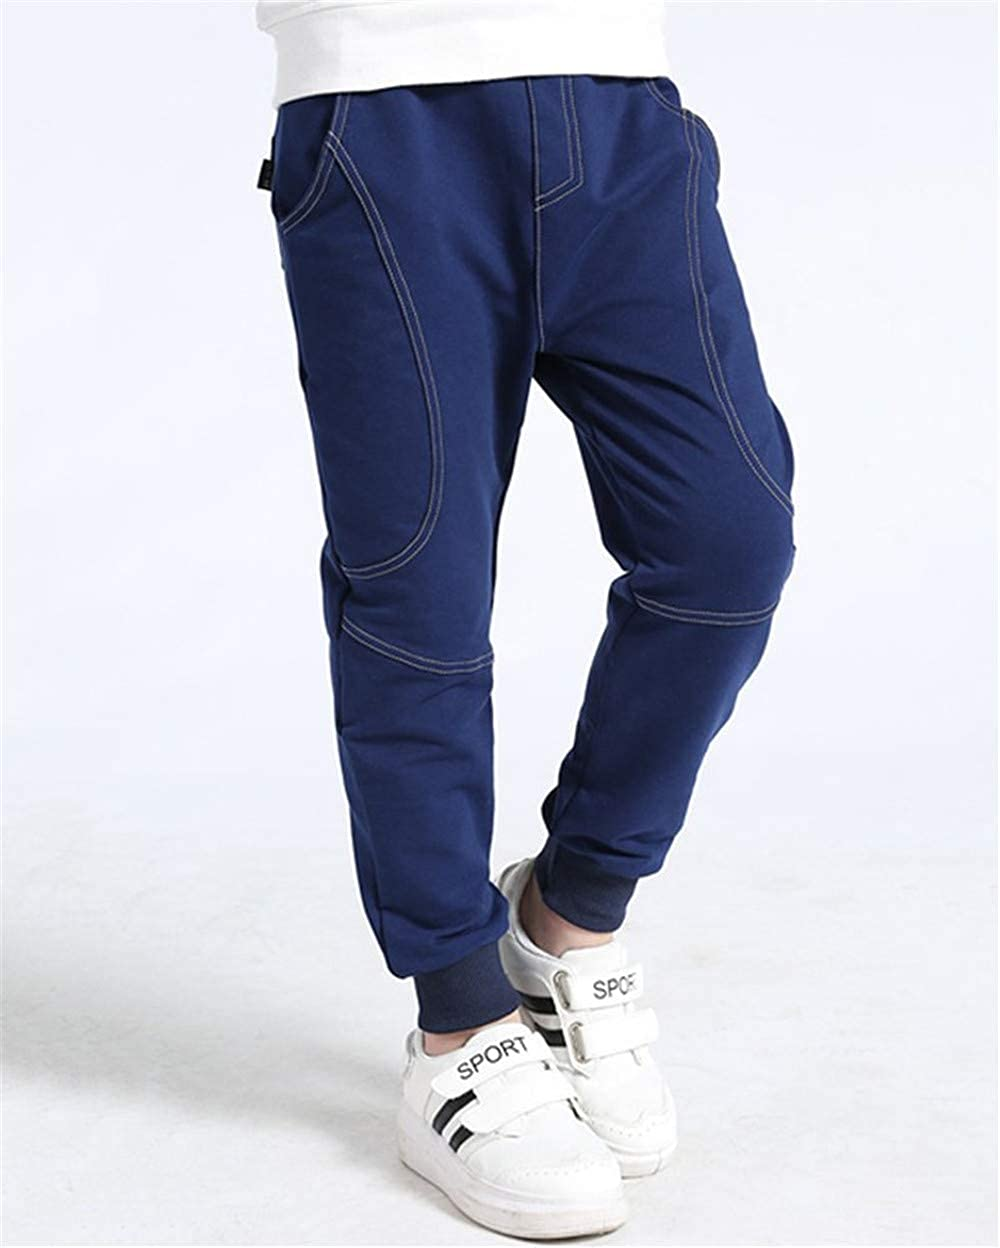 Pantaloni Sportivi Harajuku 120 Cm-160 Cm Cuciture Monocromatiche Tasty Life Pantaloni Sportivi da Ragazzo Pantaloni Jogging Morbidi Caldi Pantaloni Invernali per Bambini